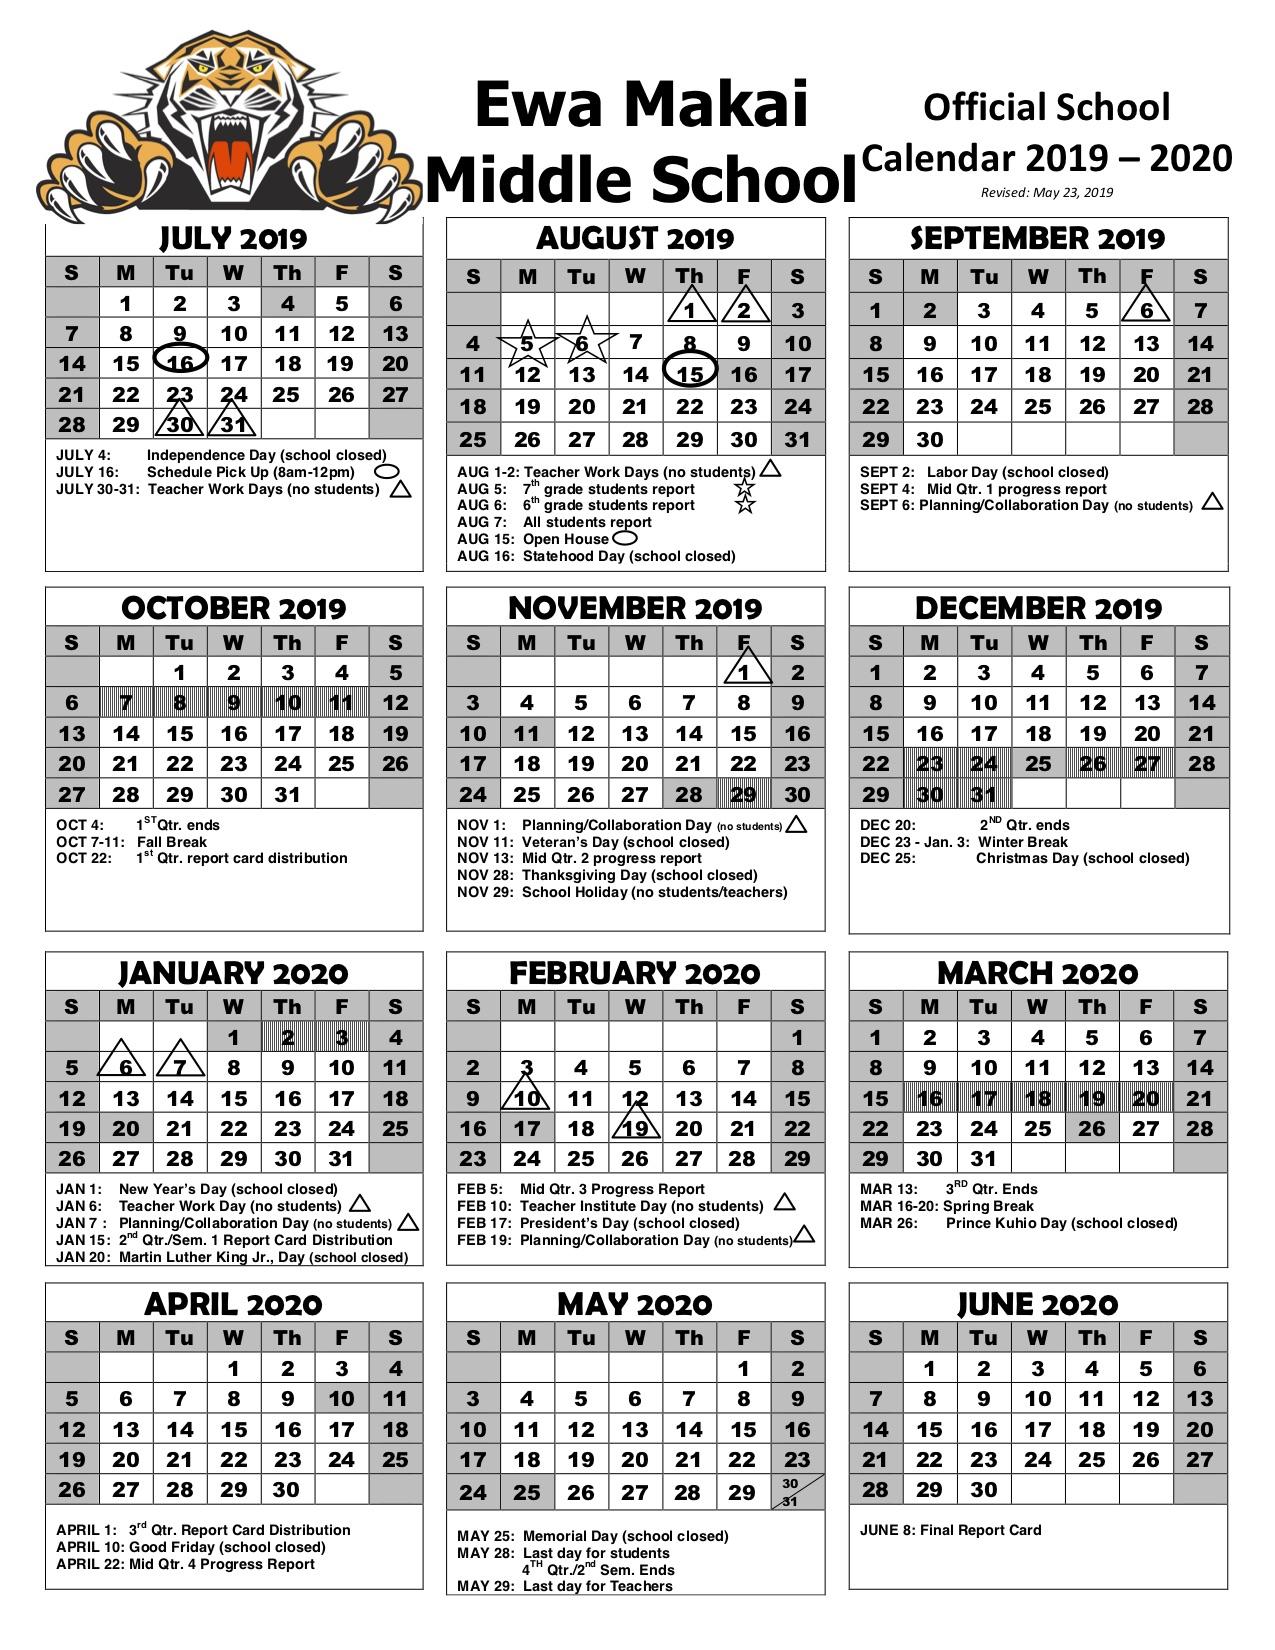 Ewa Makai Middle SY 2019-20 Calendar REVISED.jpg